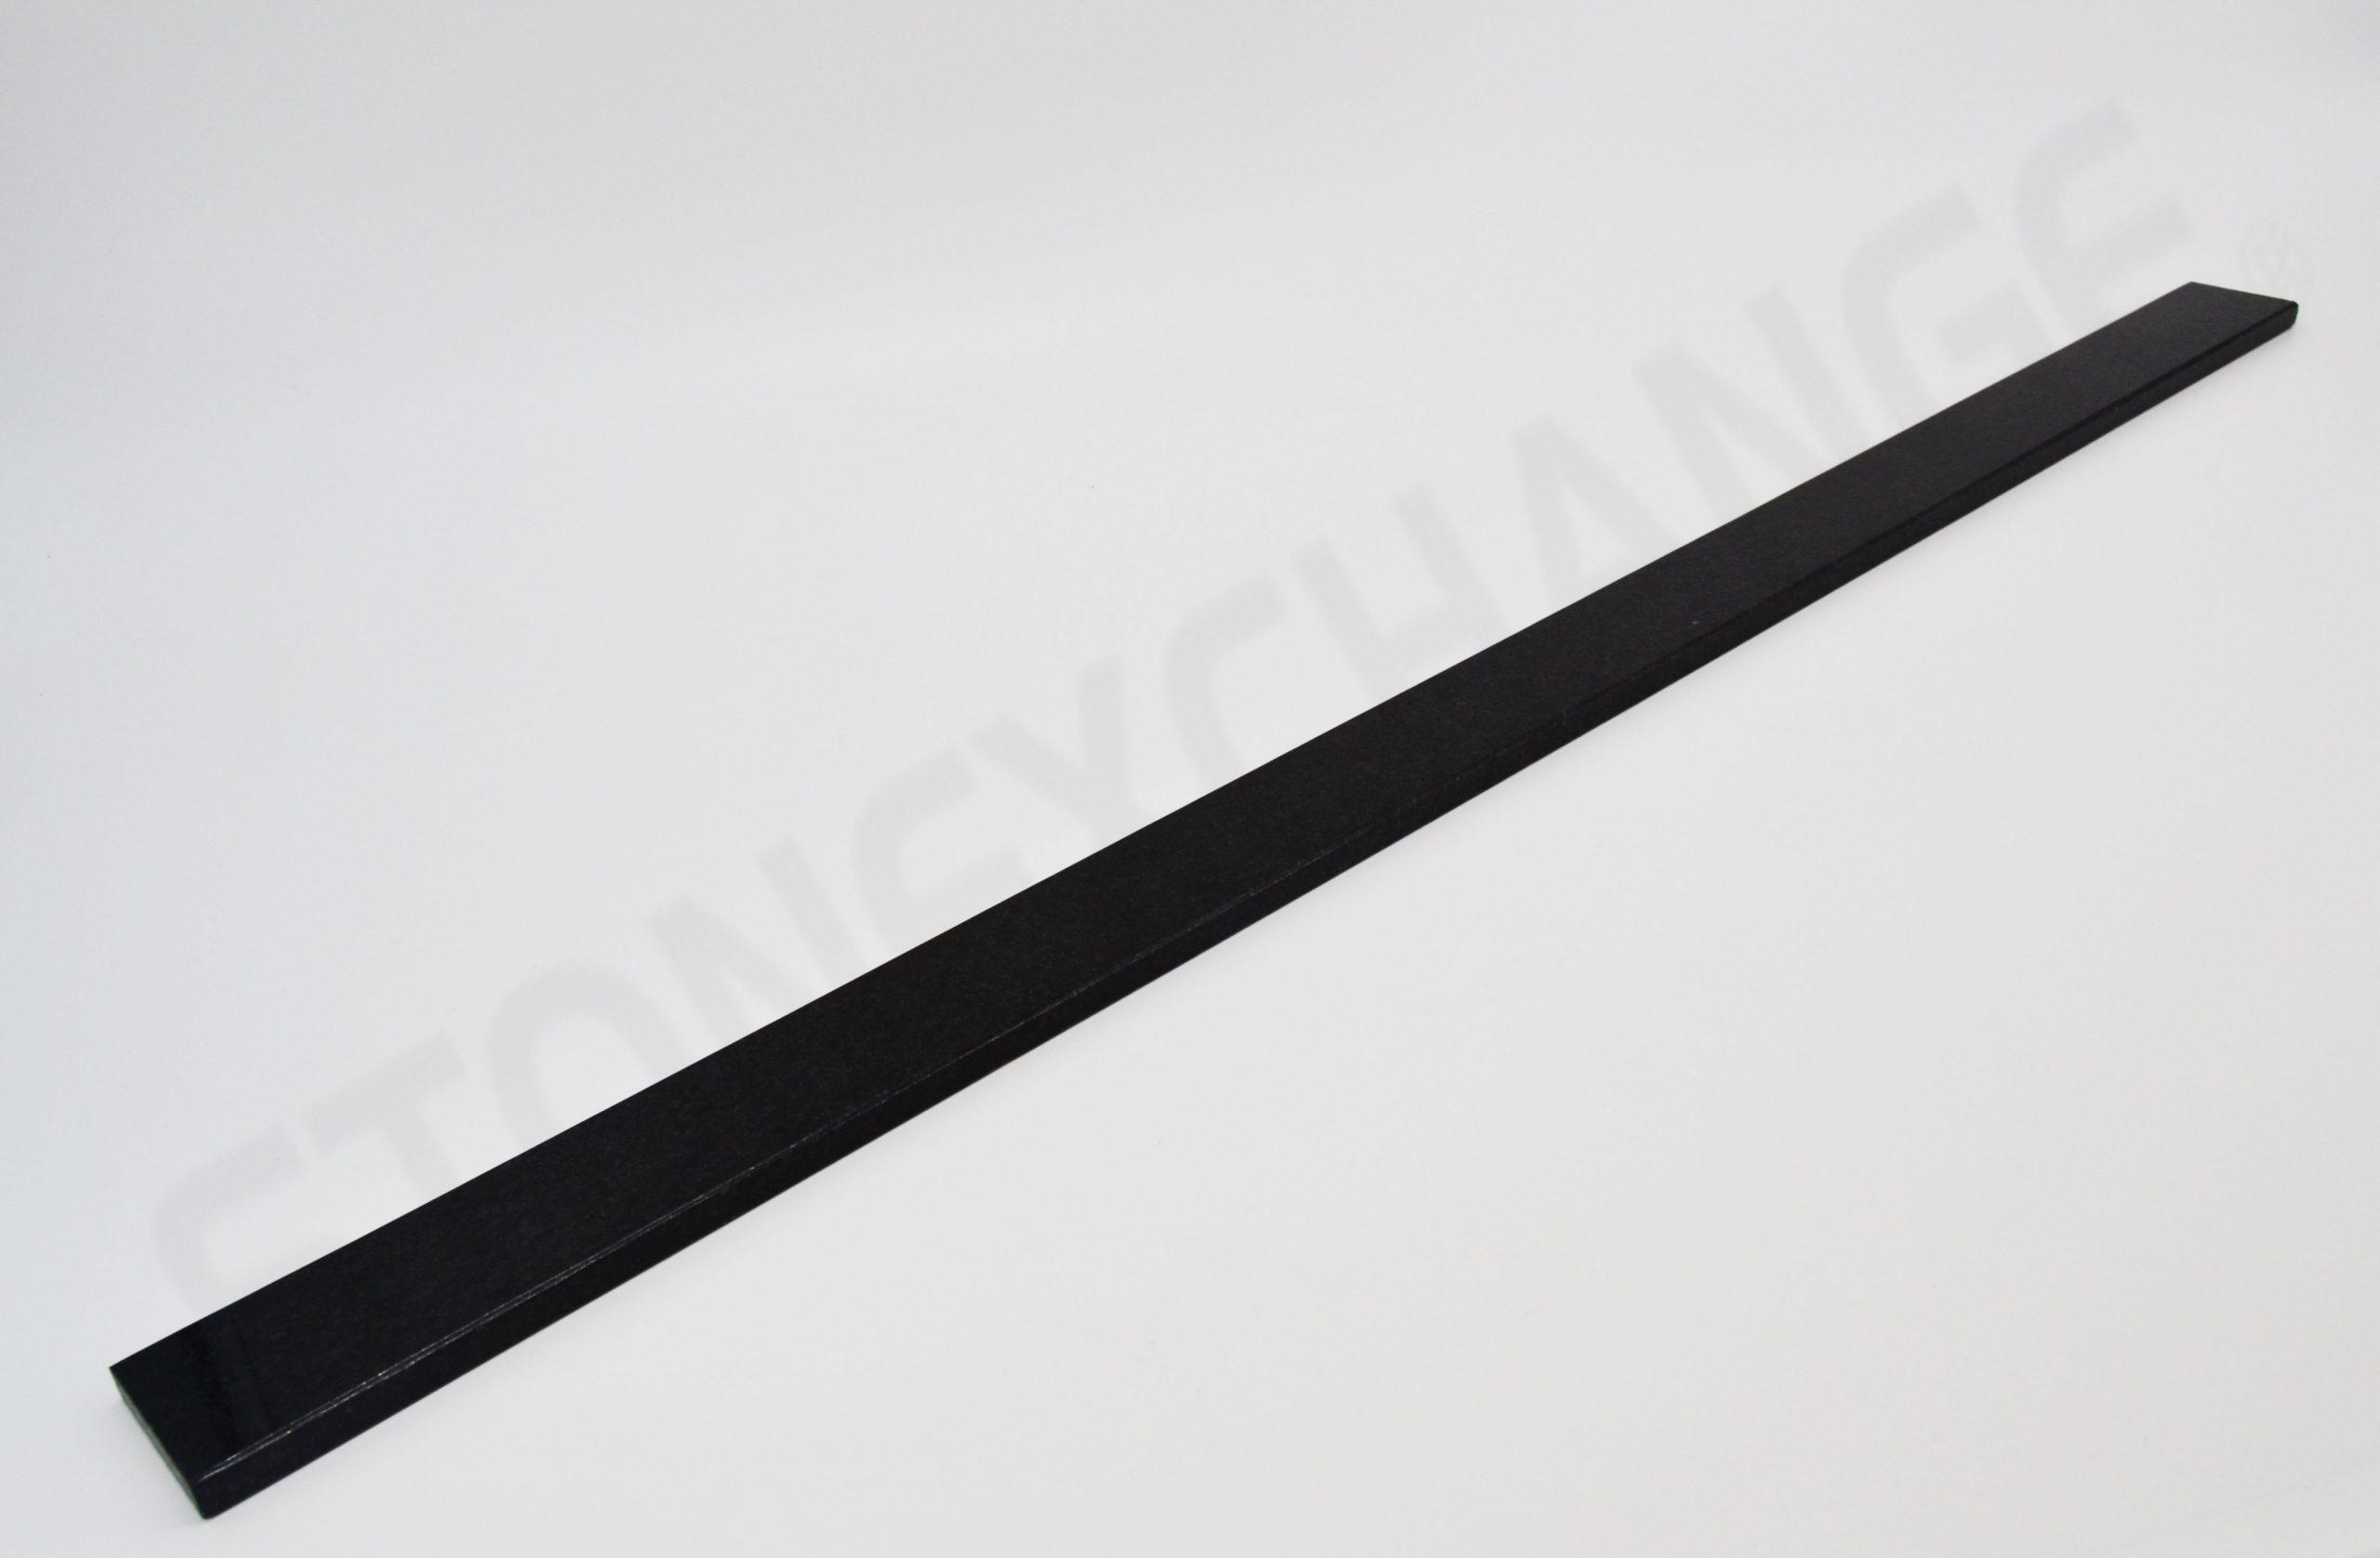 Absolute Black Standard Bevel Thresholds 2x36